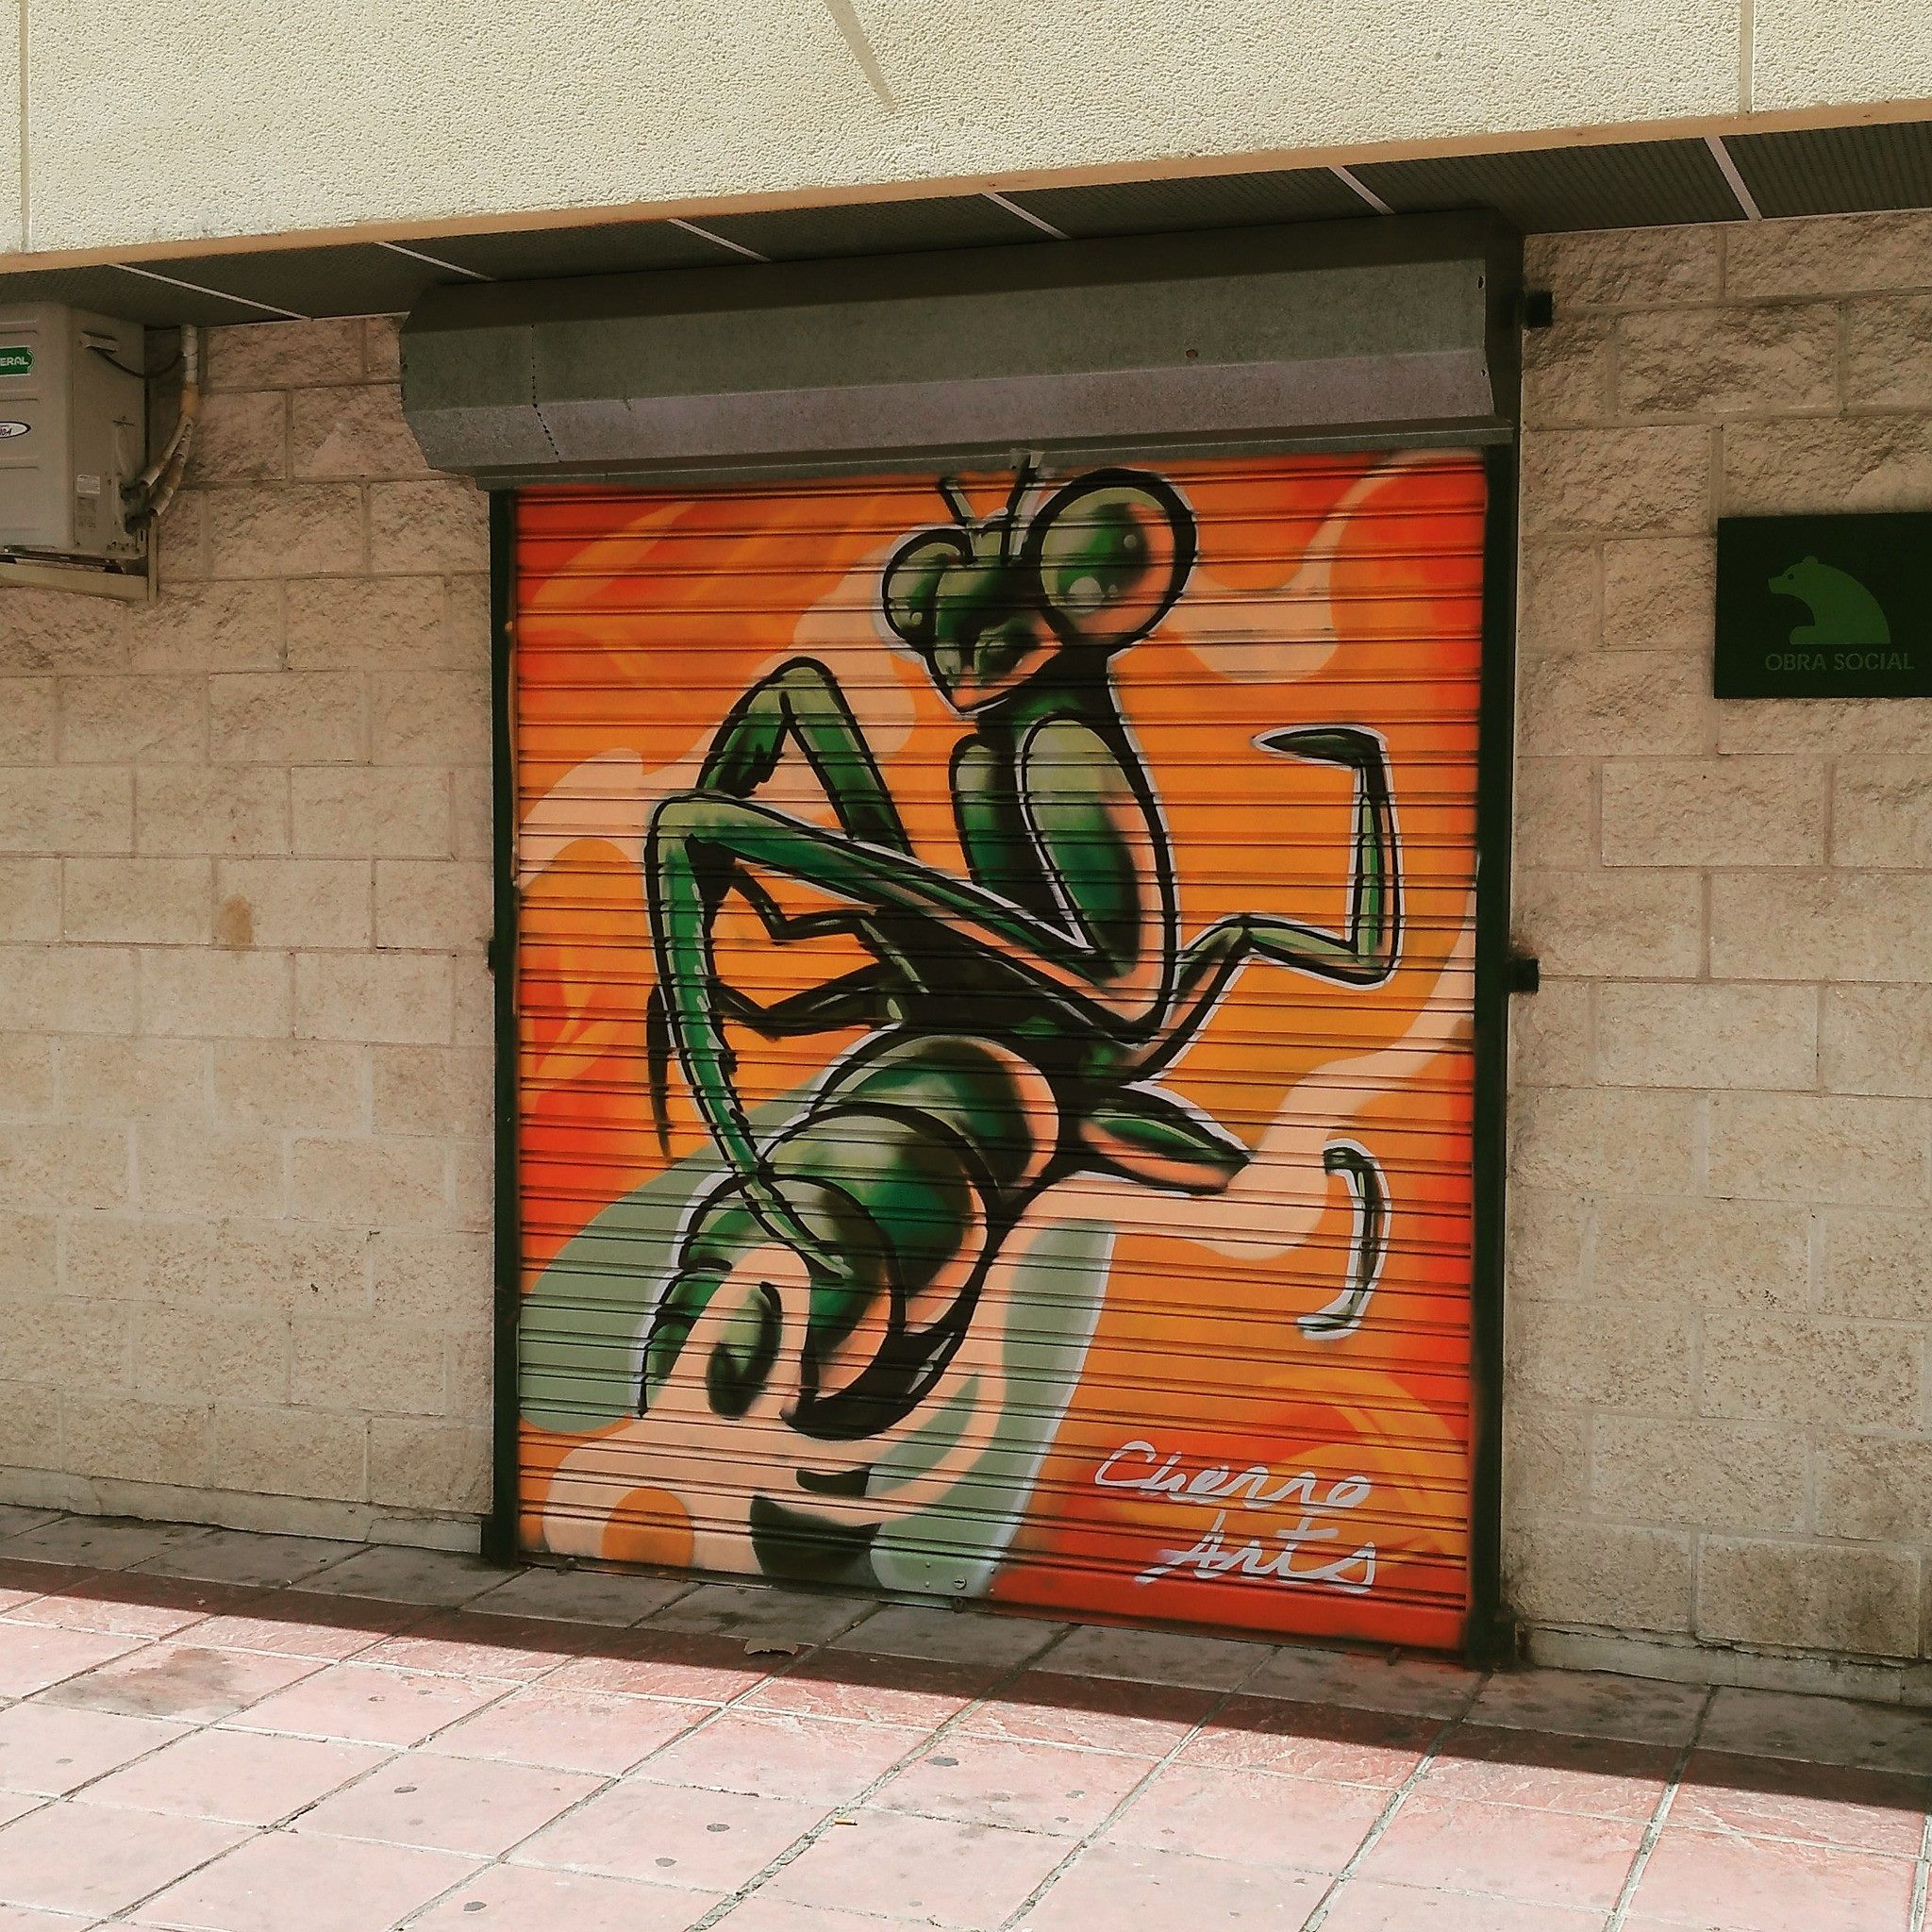 acremif palencia graffiti